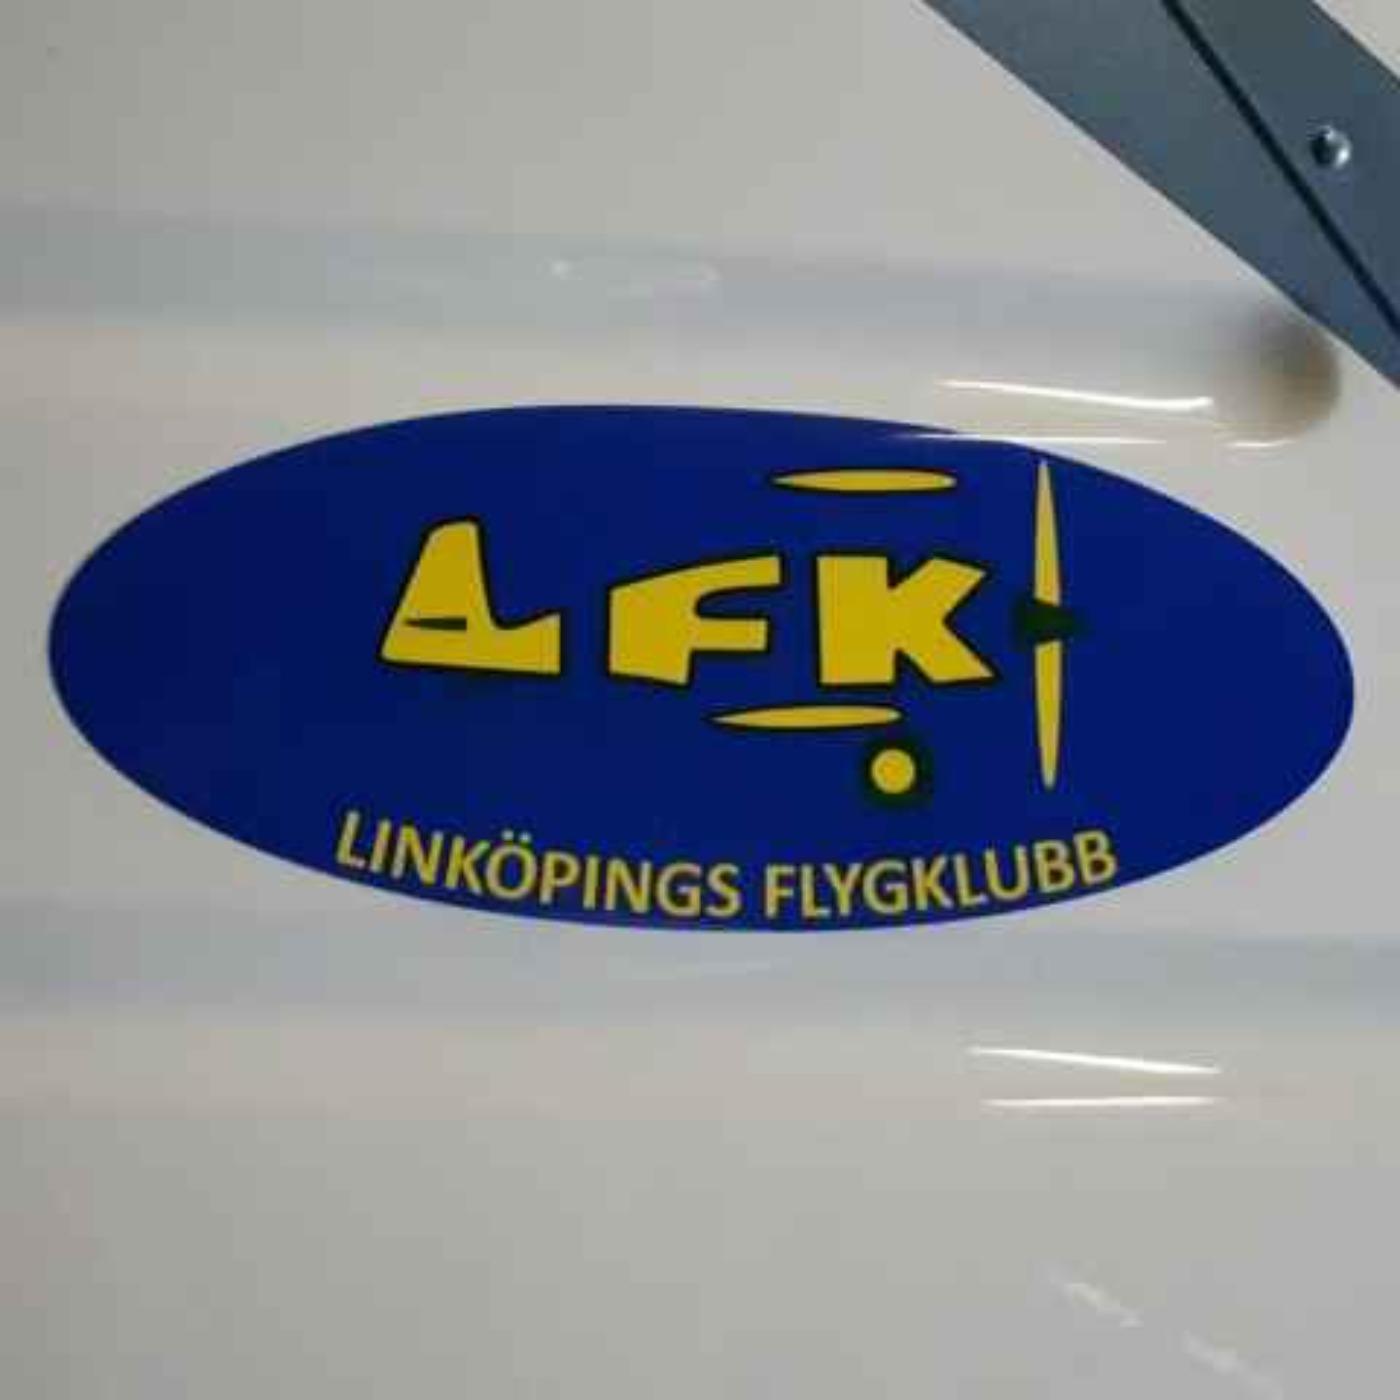 Linköpings Flygklubb - LFK